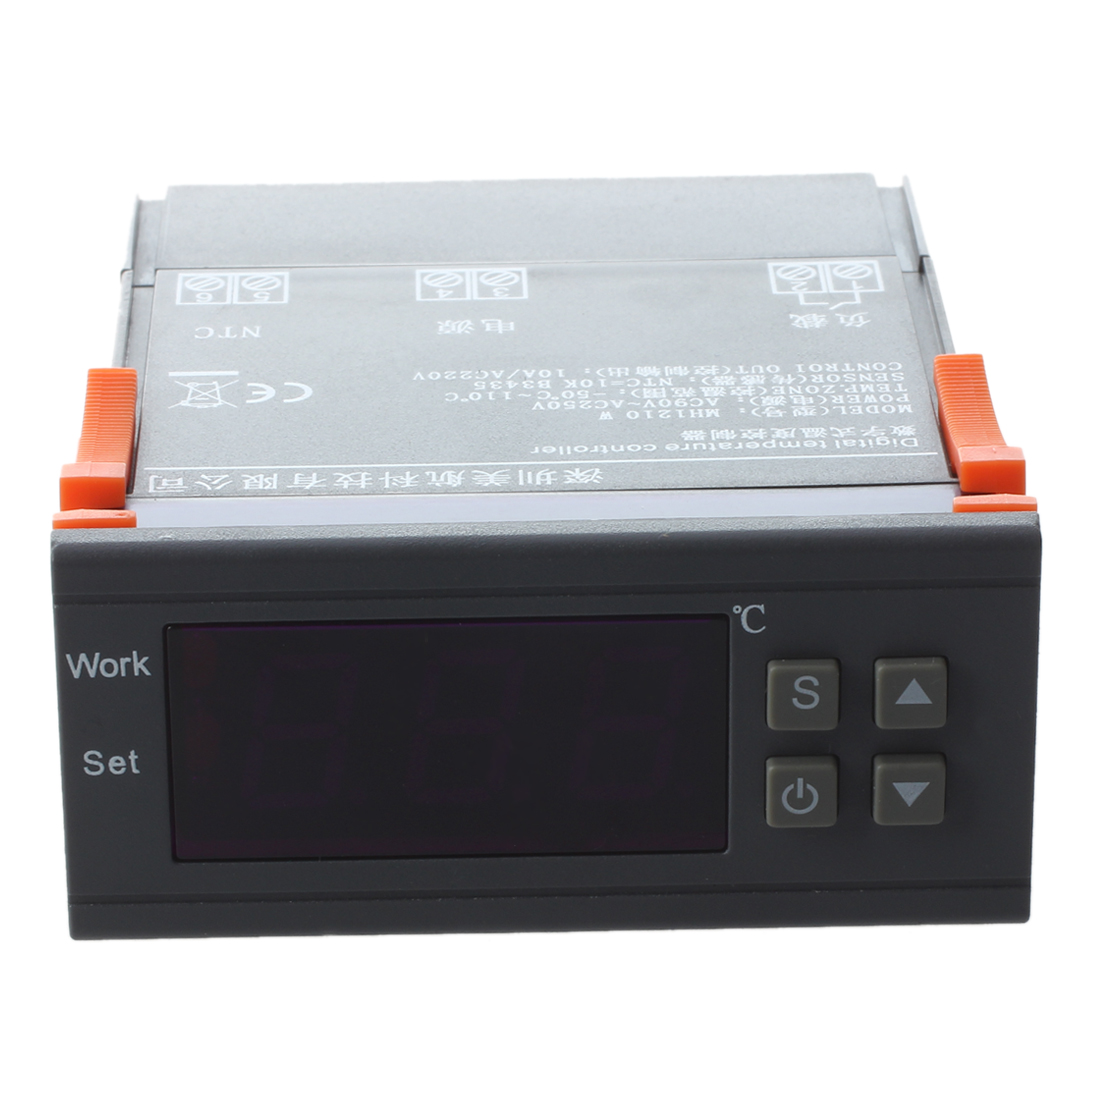 AC 90V-250V MH1210W Digital Temperature Controller screen ac 150v 250v 800w double digits digital power controller dpc ii 800r zqpww